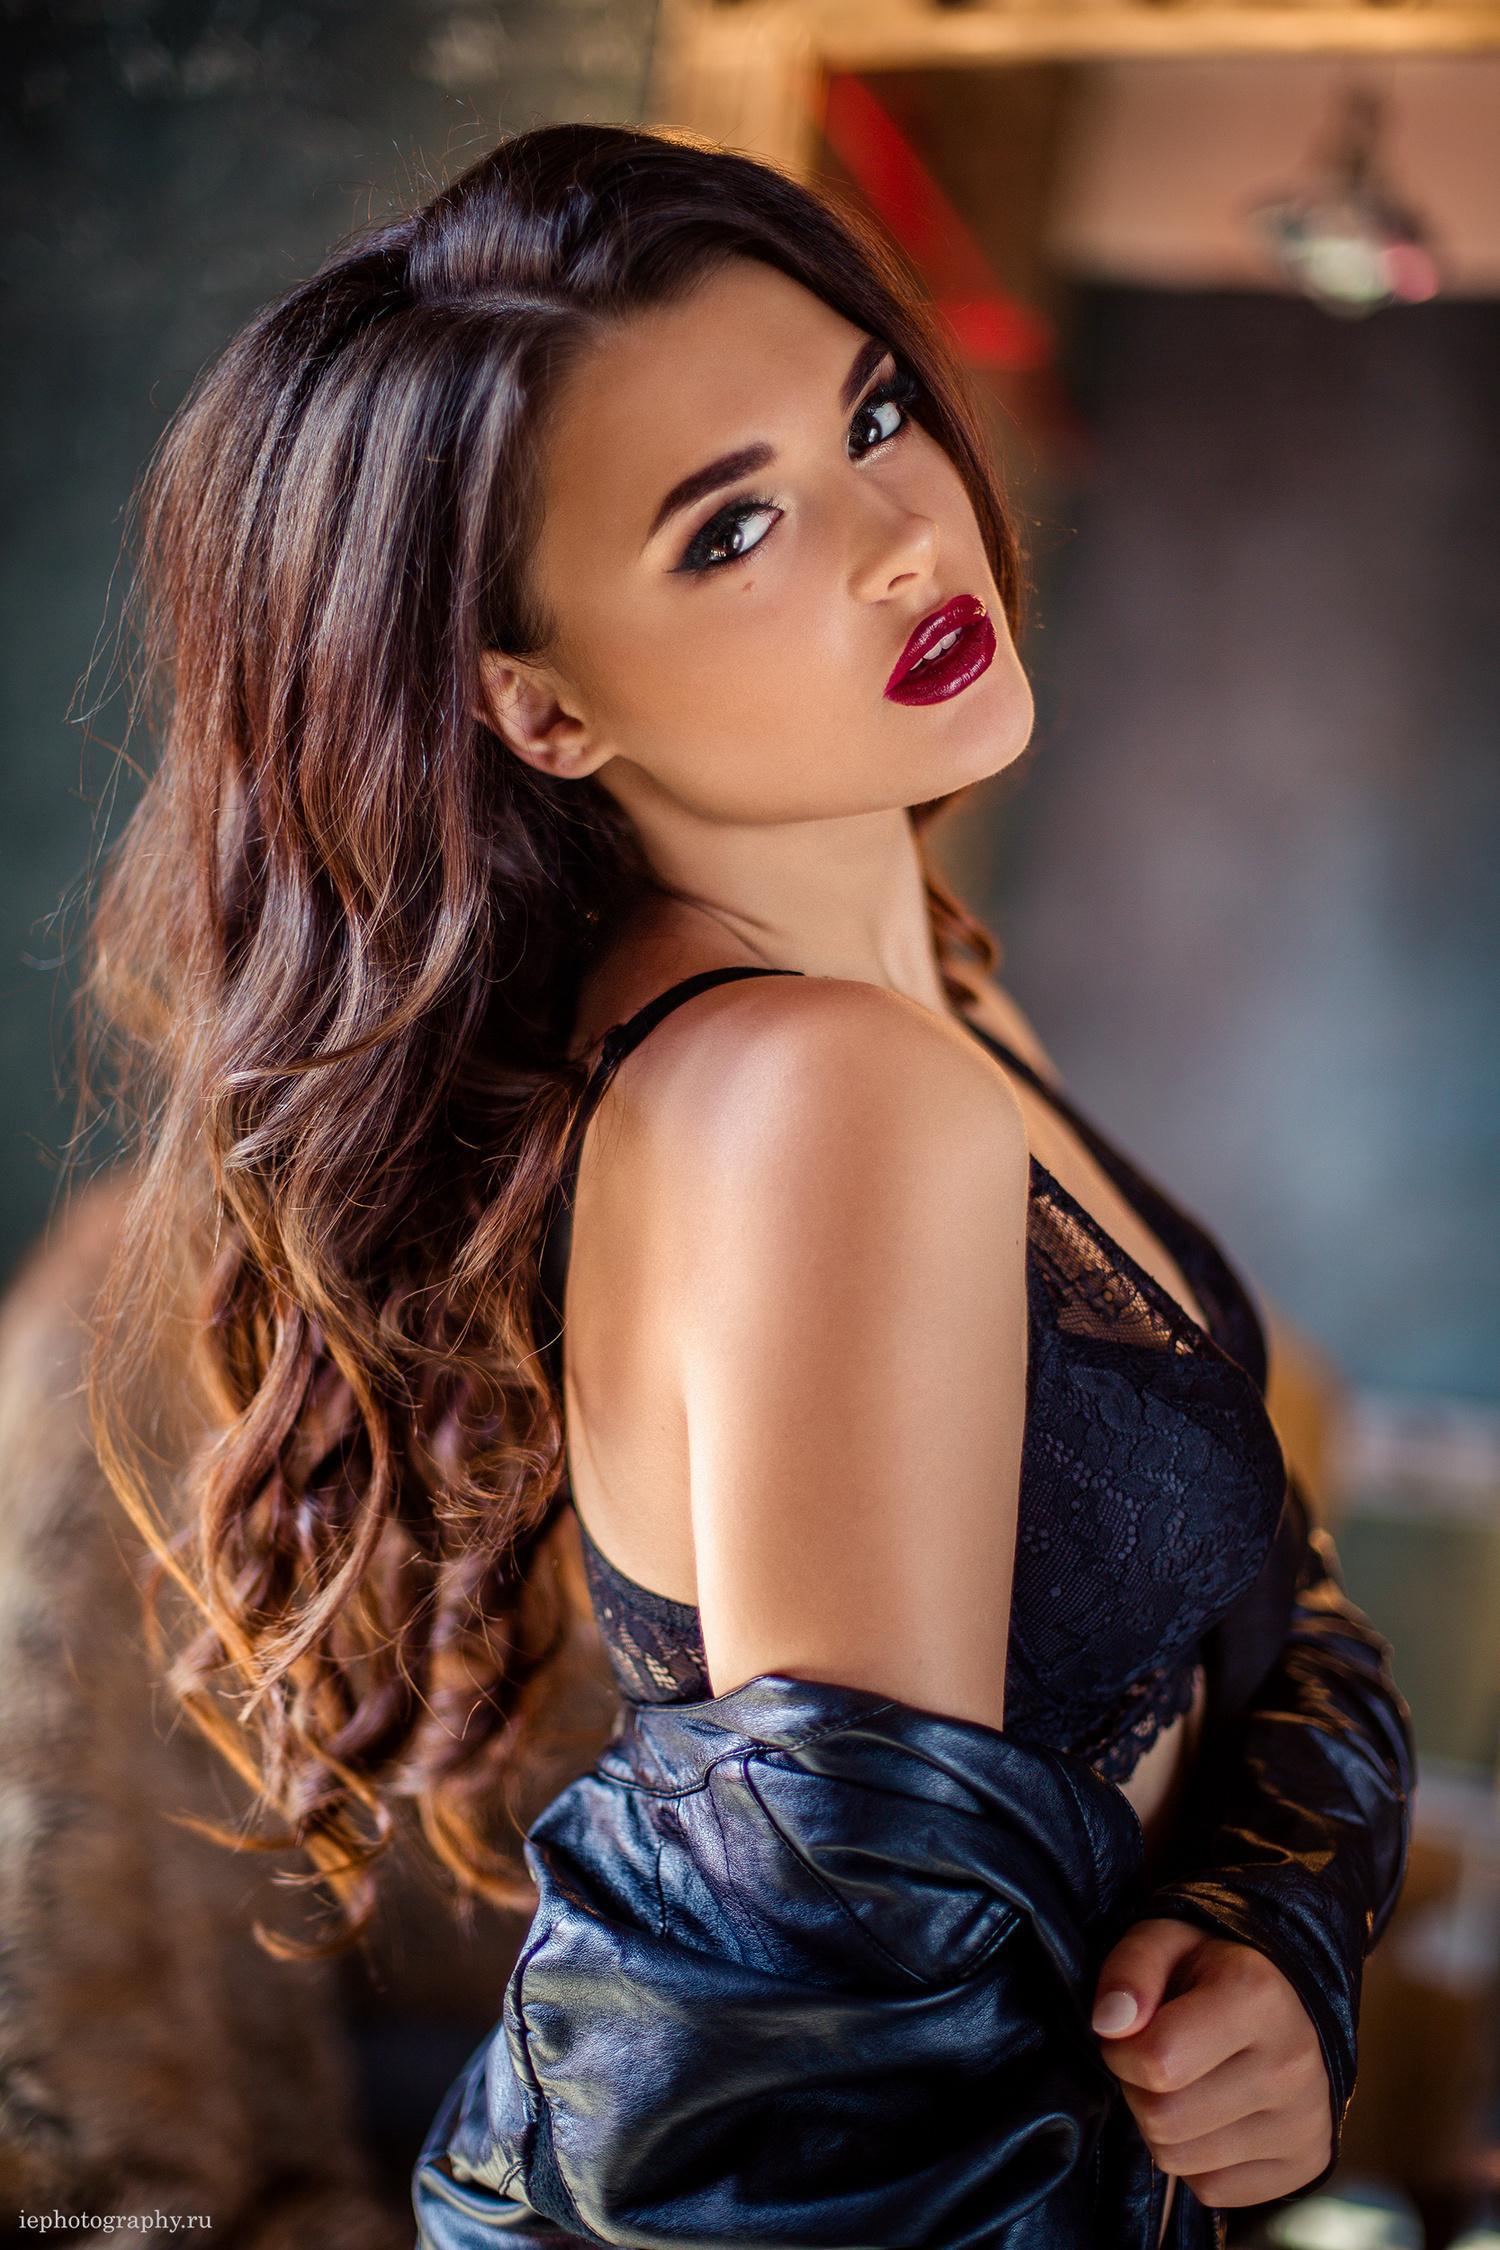 girl woman fashion sexy glamour pretty portrait model lips cute